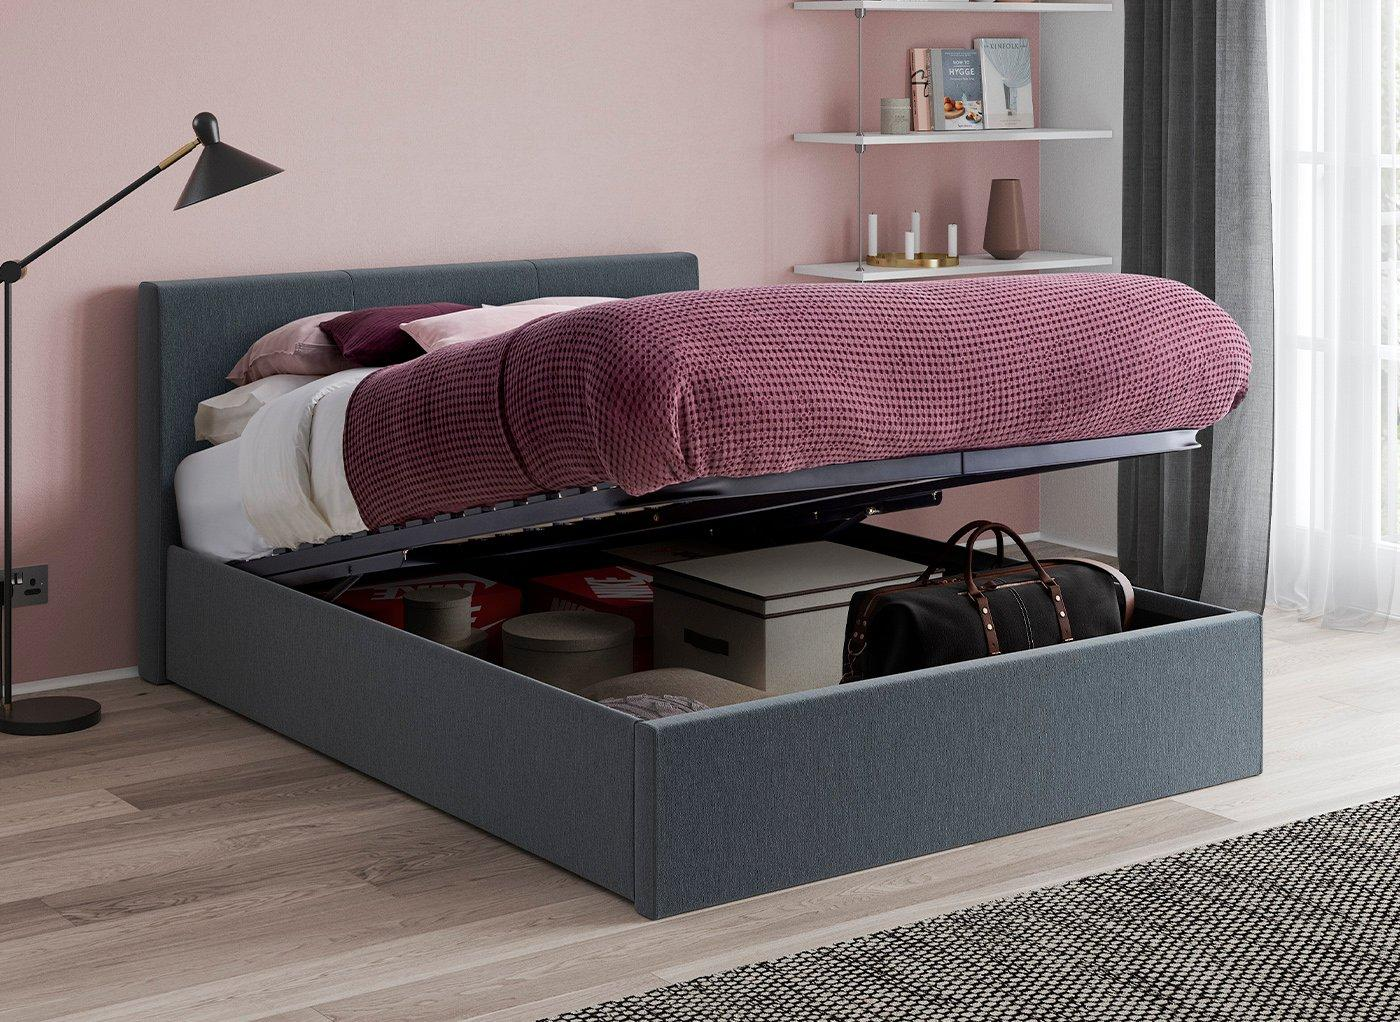 Yardley Upholstered Ottoman Bed Frame 3'0 Single GREY